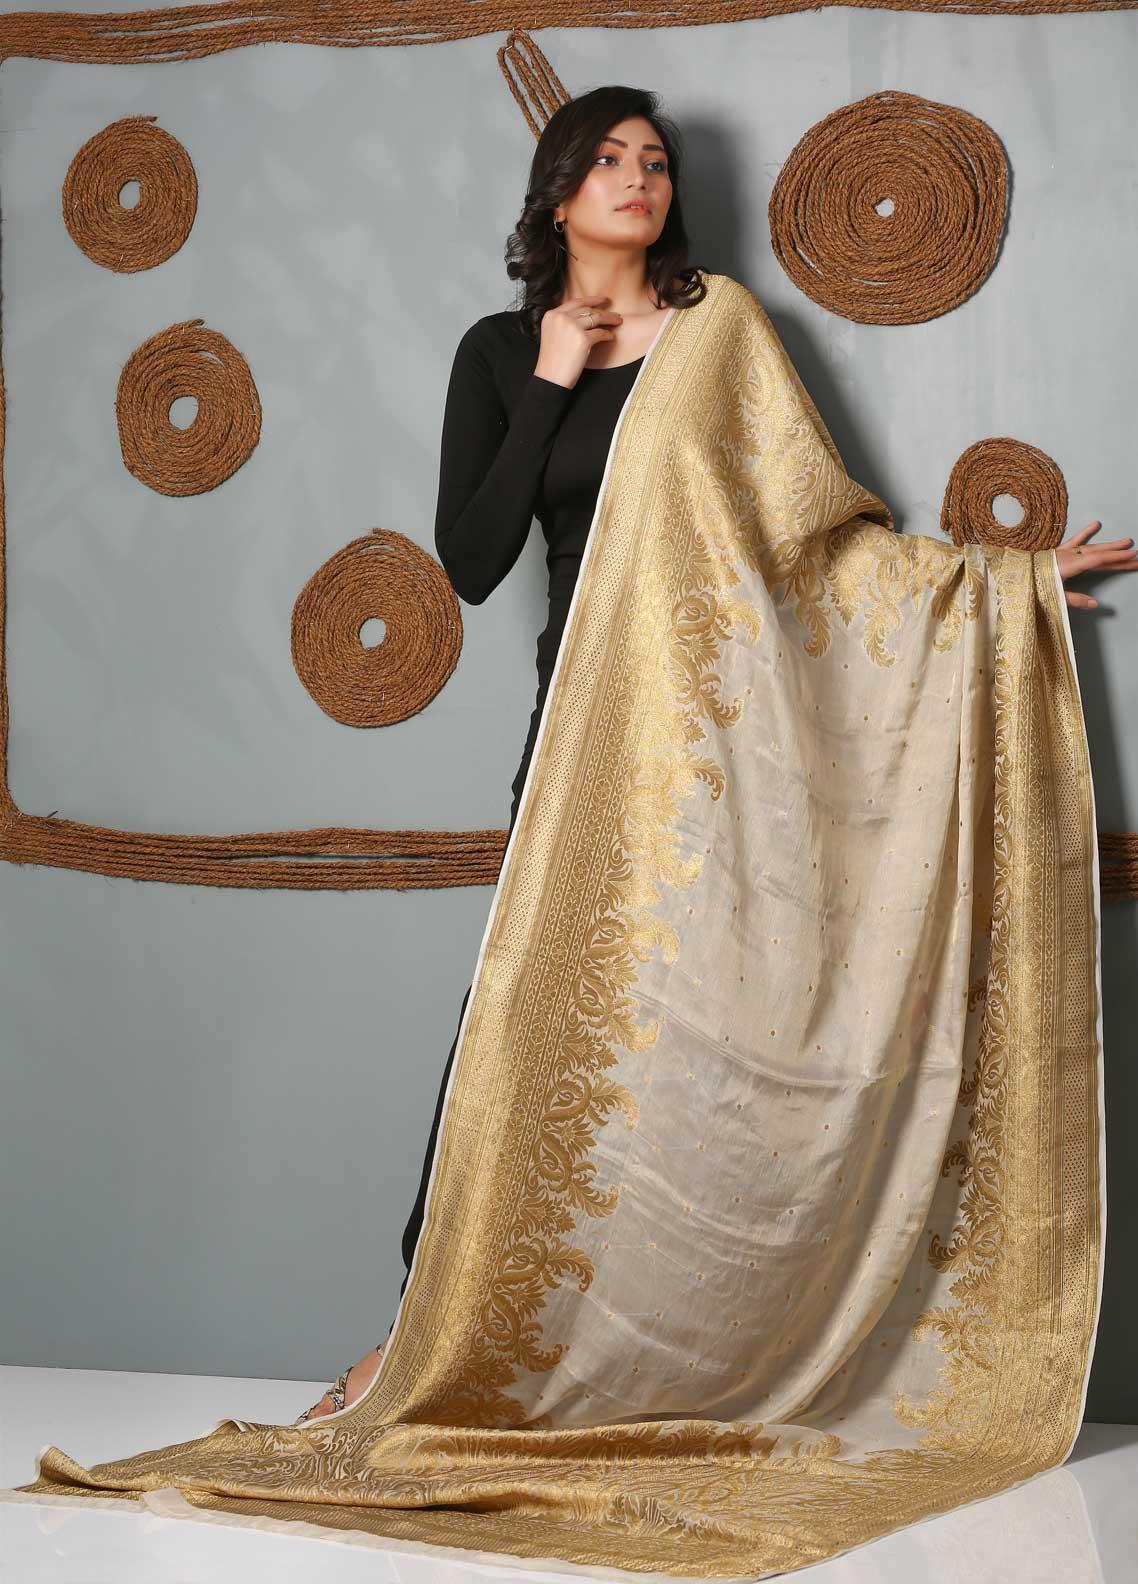 Al Rahim Banarsi Embroidered Banarsi  Shawl AR21BS DMR205 Baige - Banarsi Shawls